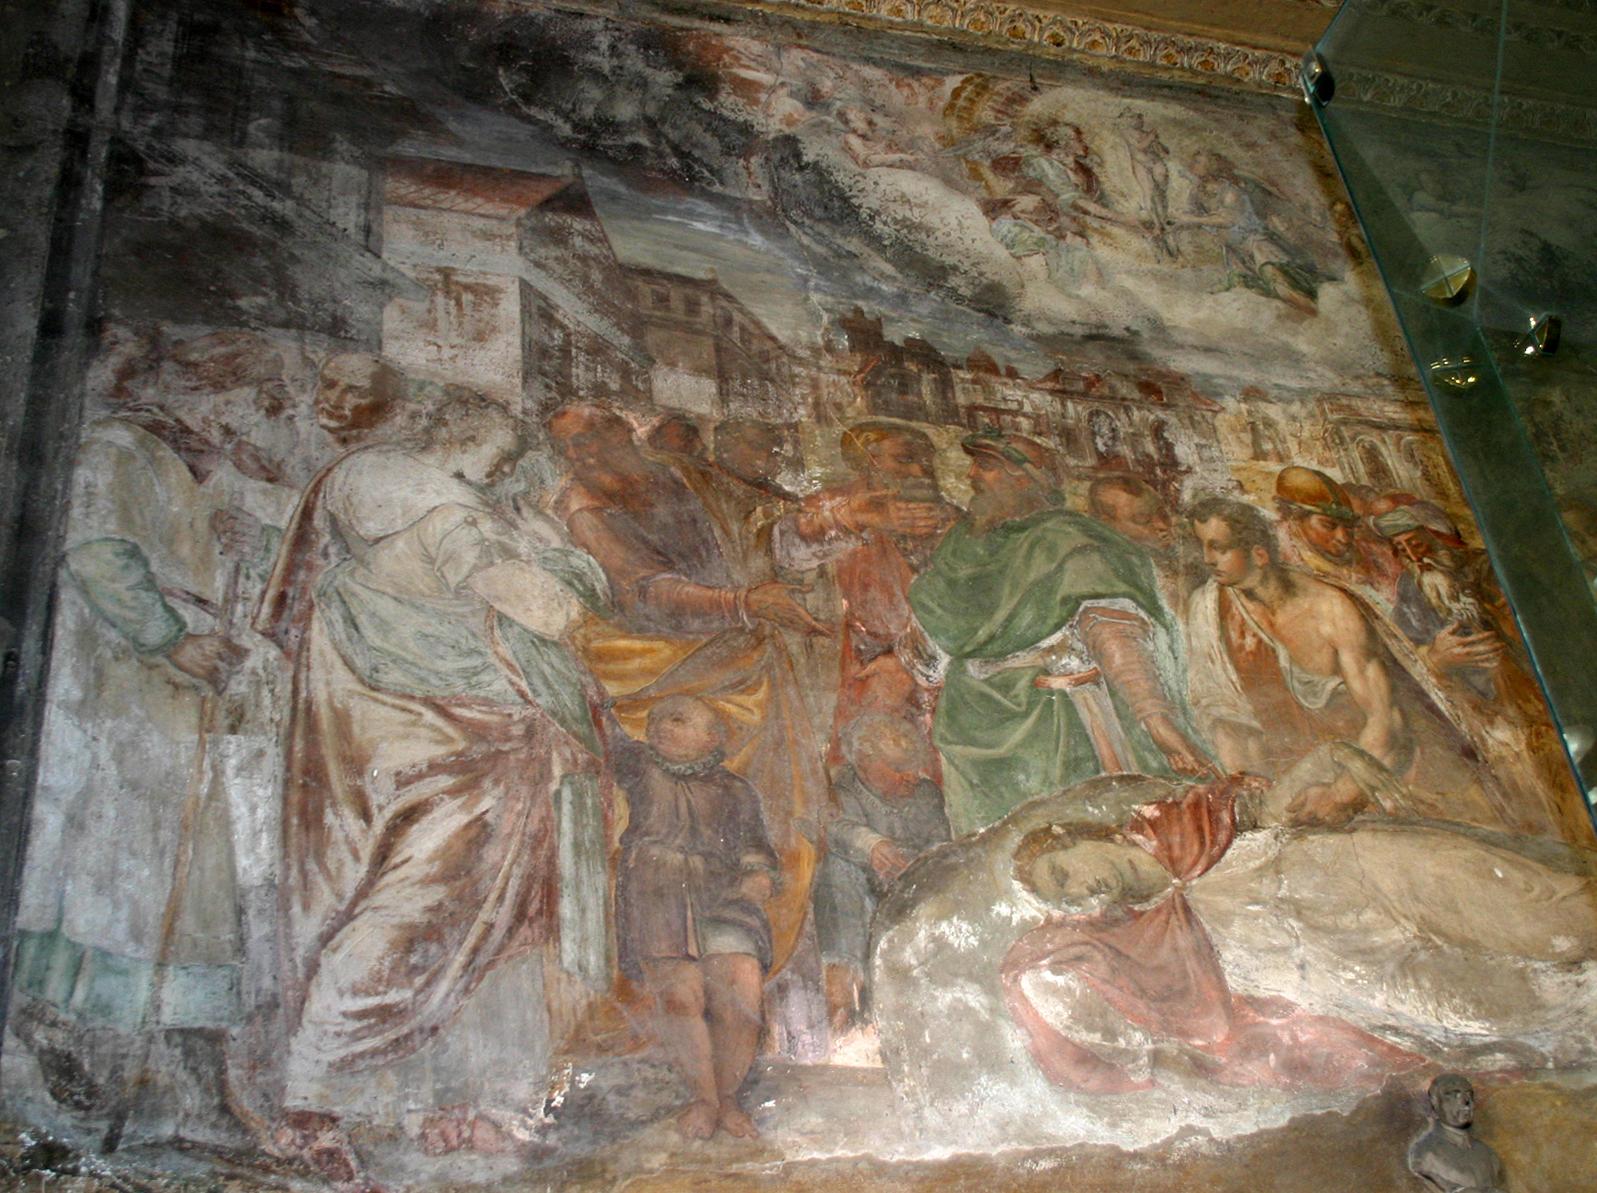 Aquilinus of Milan